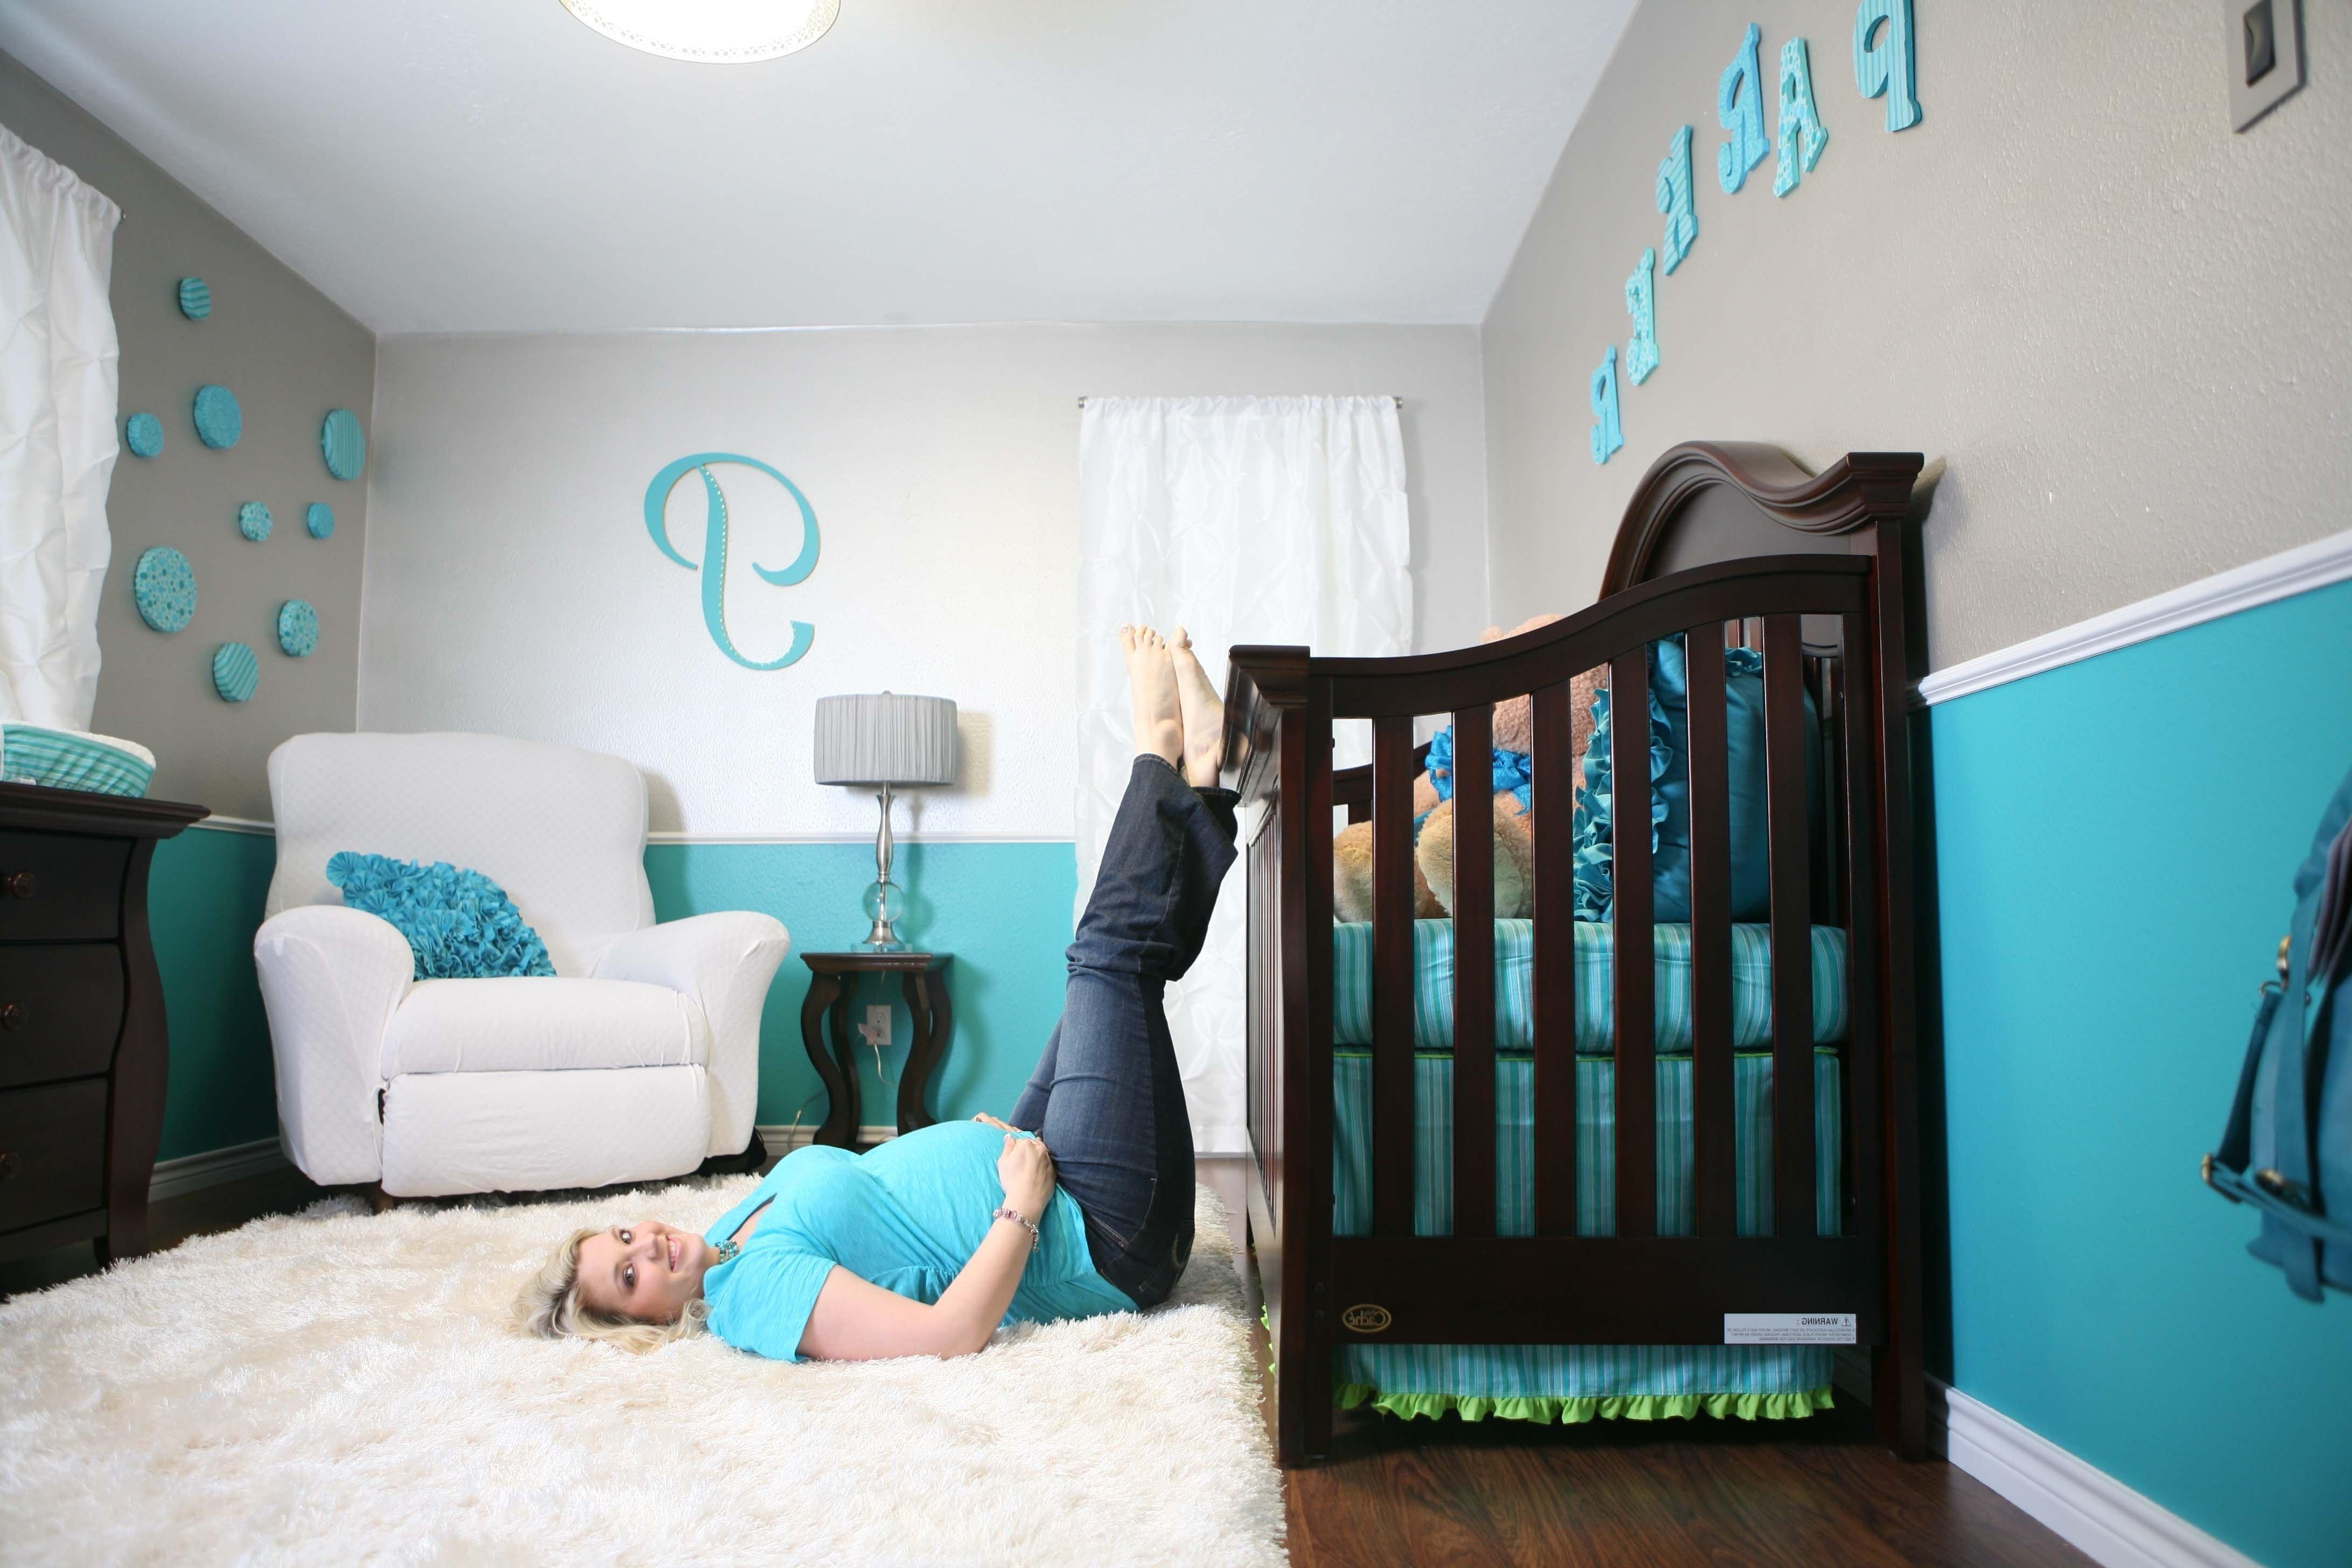 10 Unique Baby Boy Room Decor Ideas kids room ideas kid for small spaces e2 80 9a ba theme boy loversiq